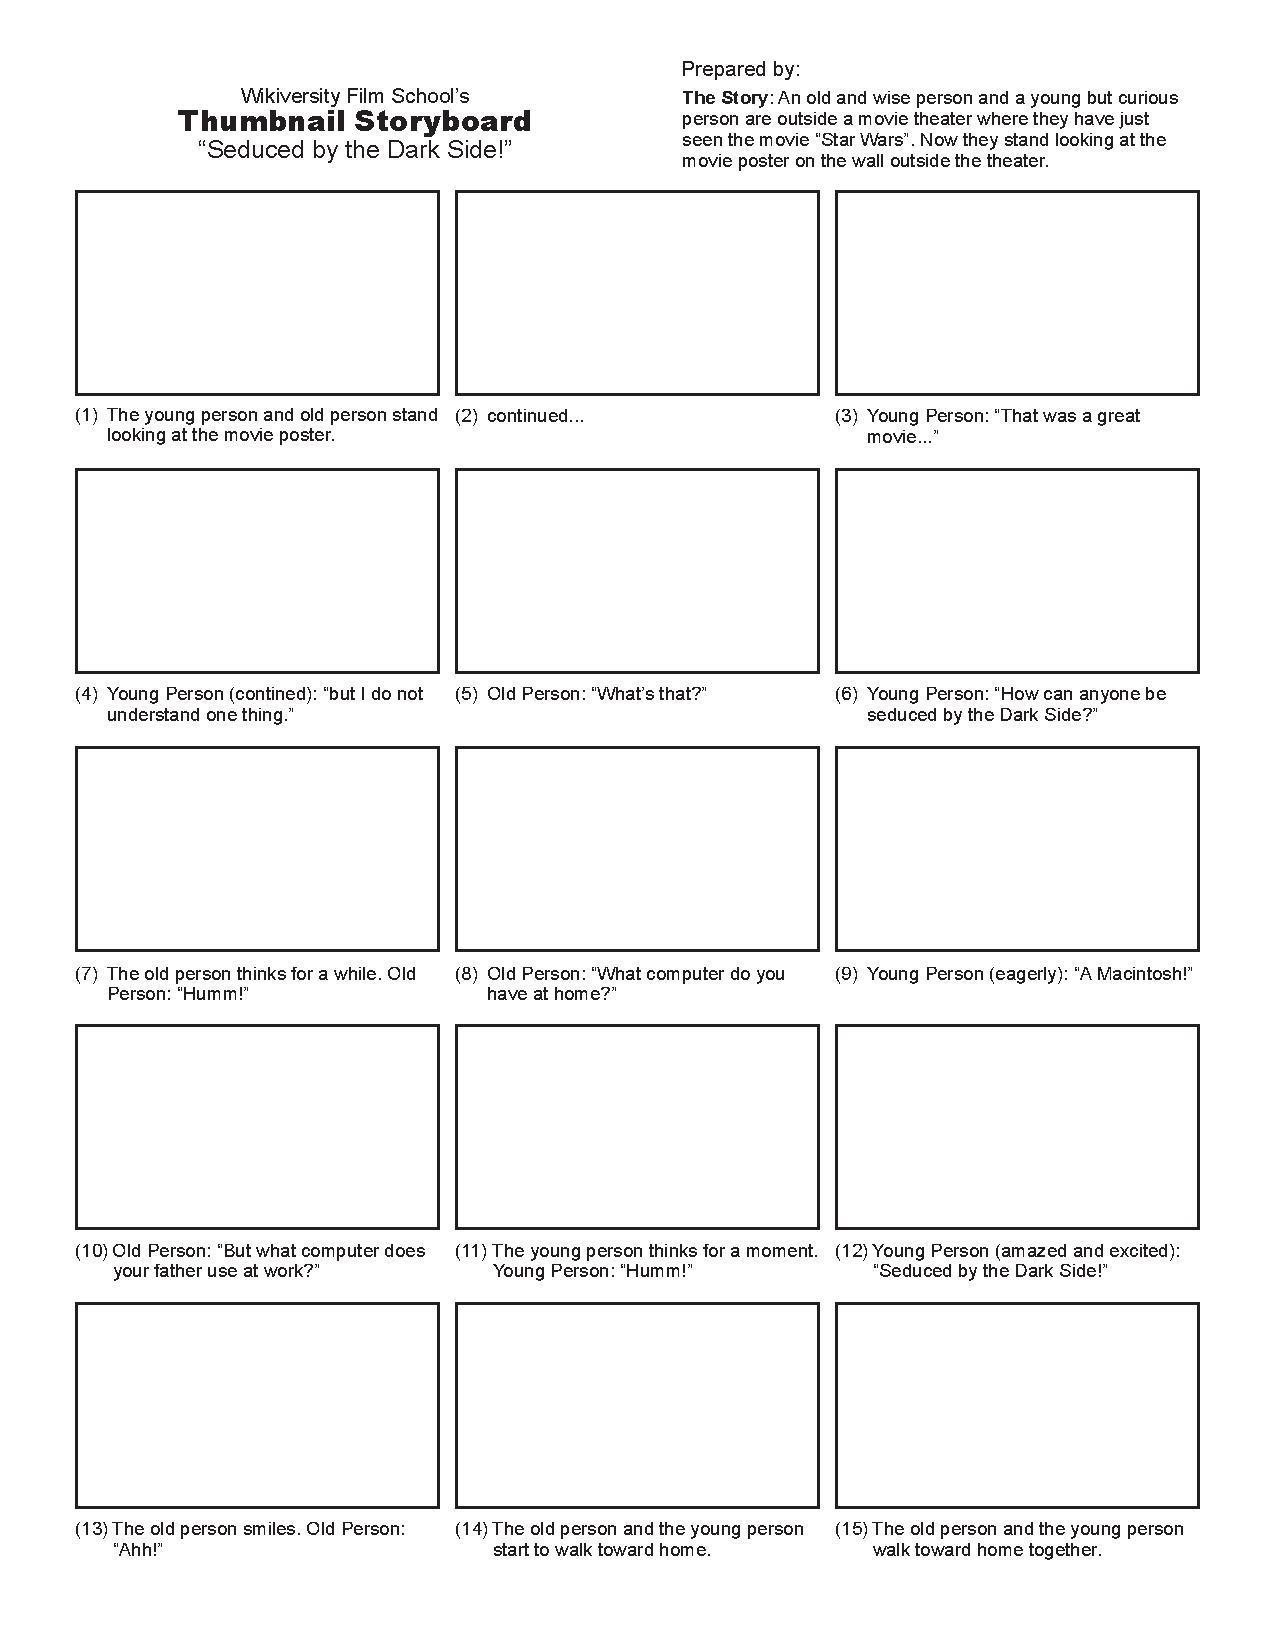 storyboard pdf - Acor.designtrail.co